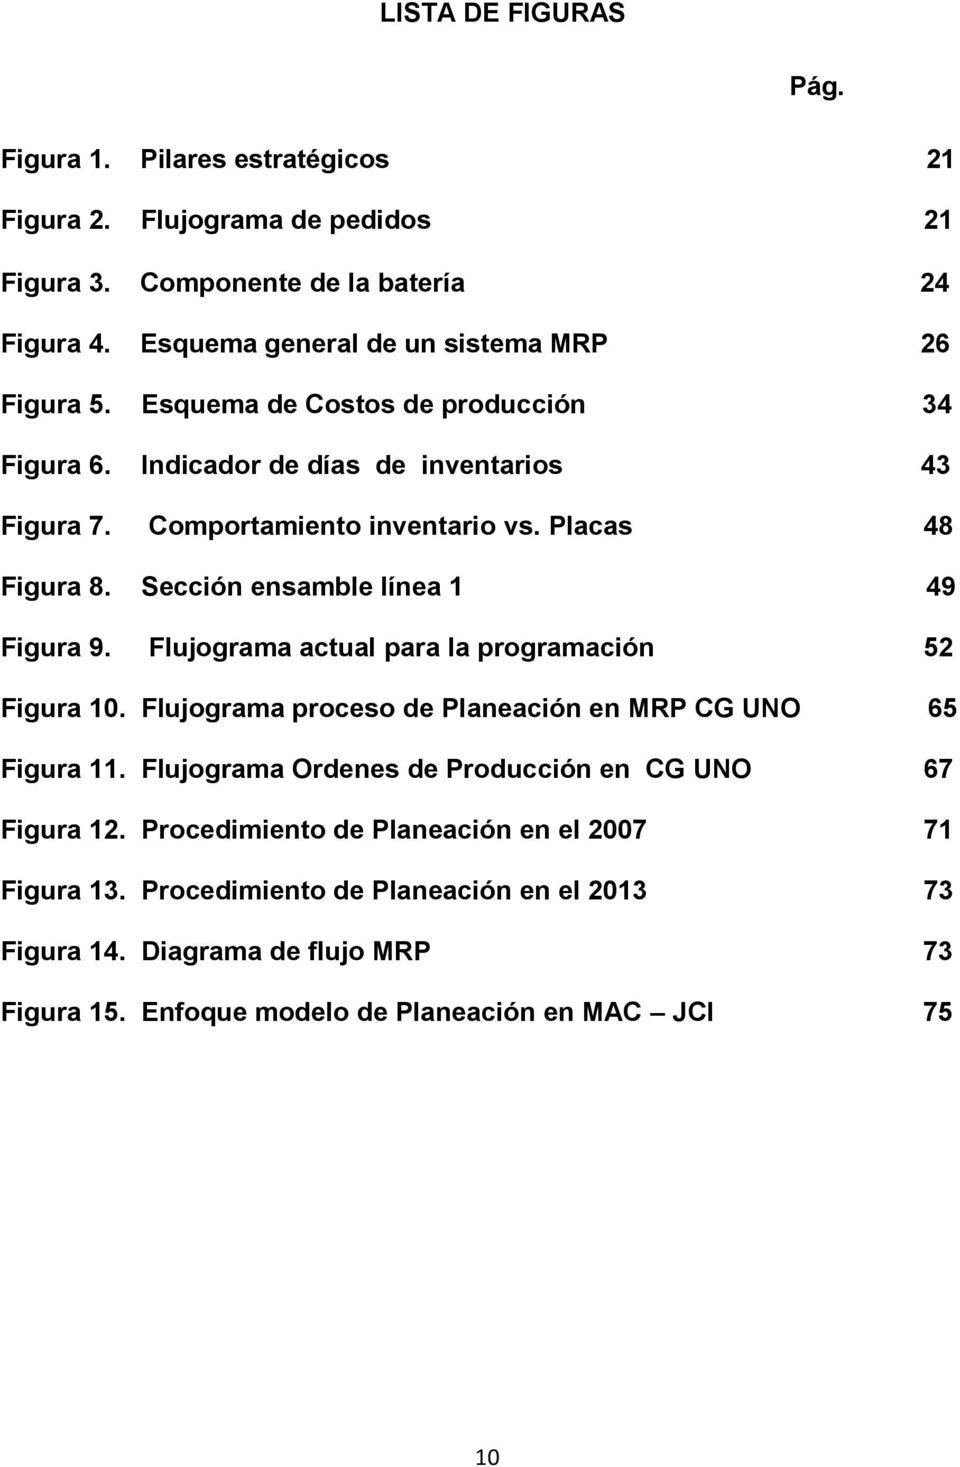 medium resolution of placas 48 figura 8 secci n ensamble l nea 1 49 figura 9 flujograma actual para